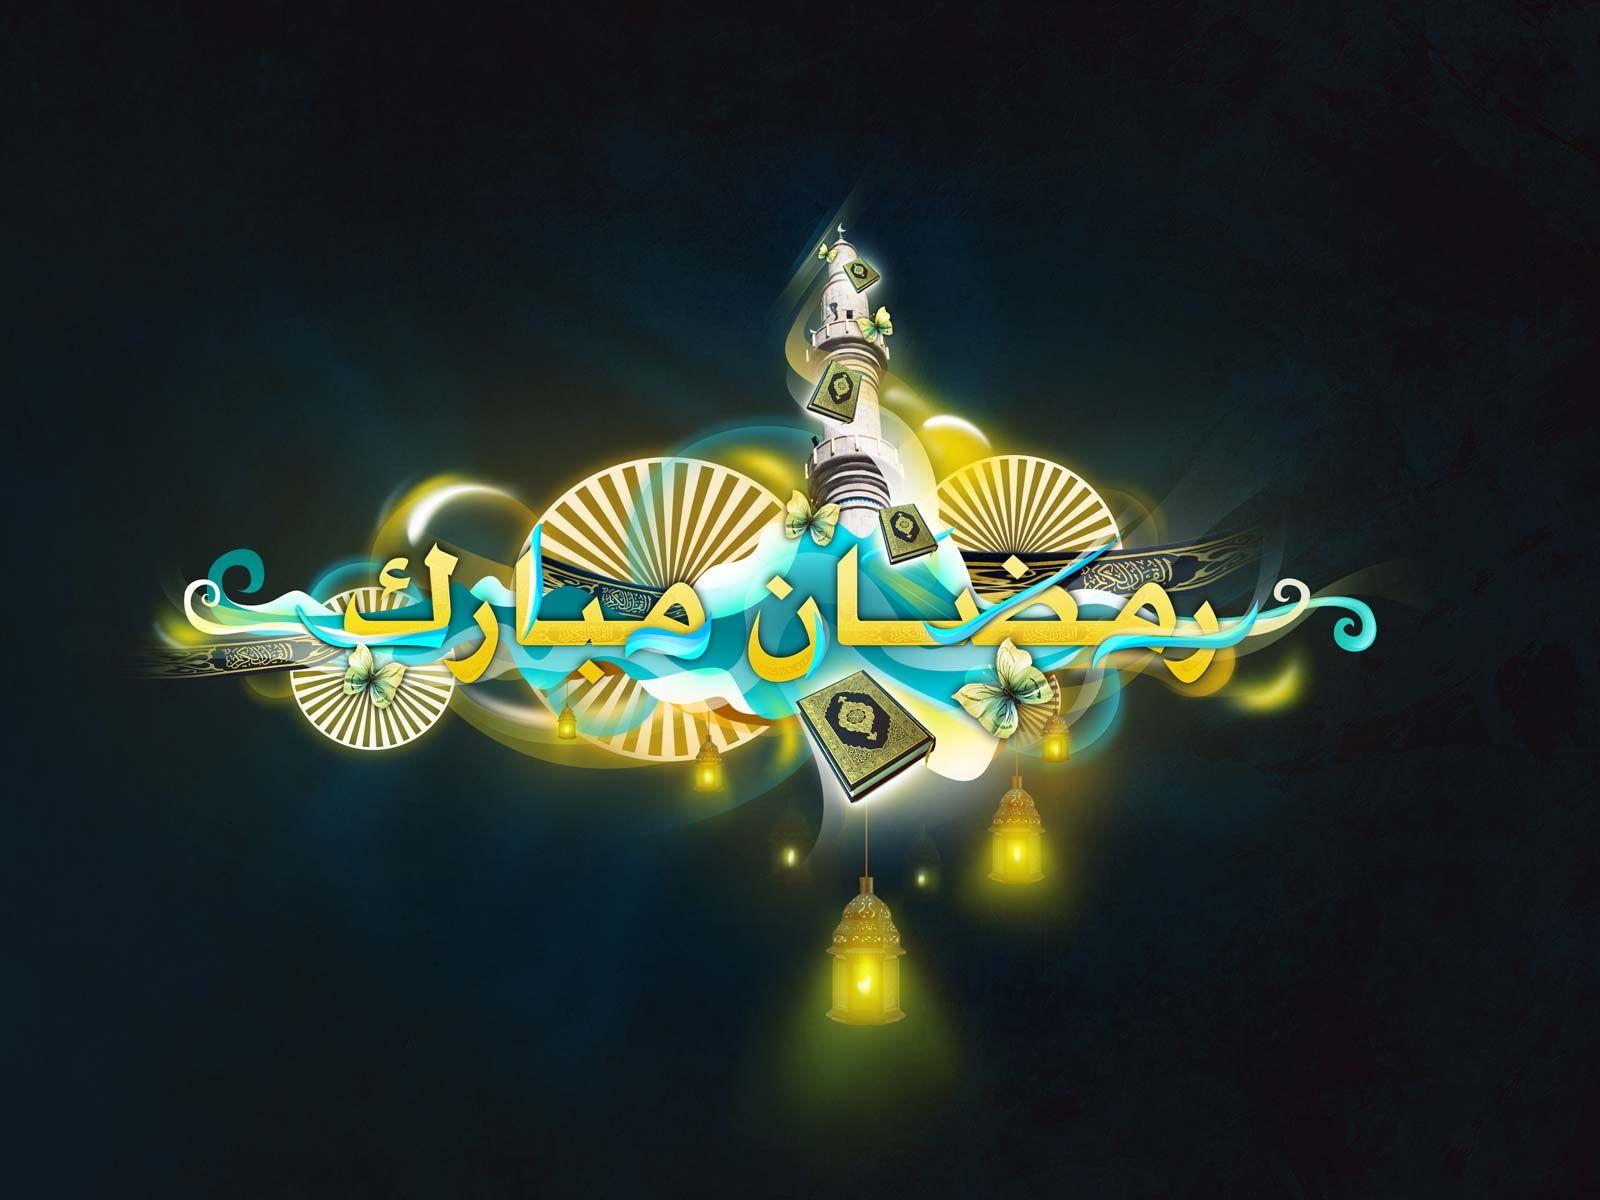 Ramadan Kareem Beautiful HD Wallpapers by scoopak Scoopak 1024×768 Ramadan Kareem Wallpaper (60 Wallpapers) | Adorable Wallpapers